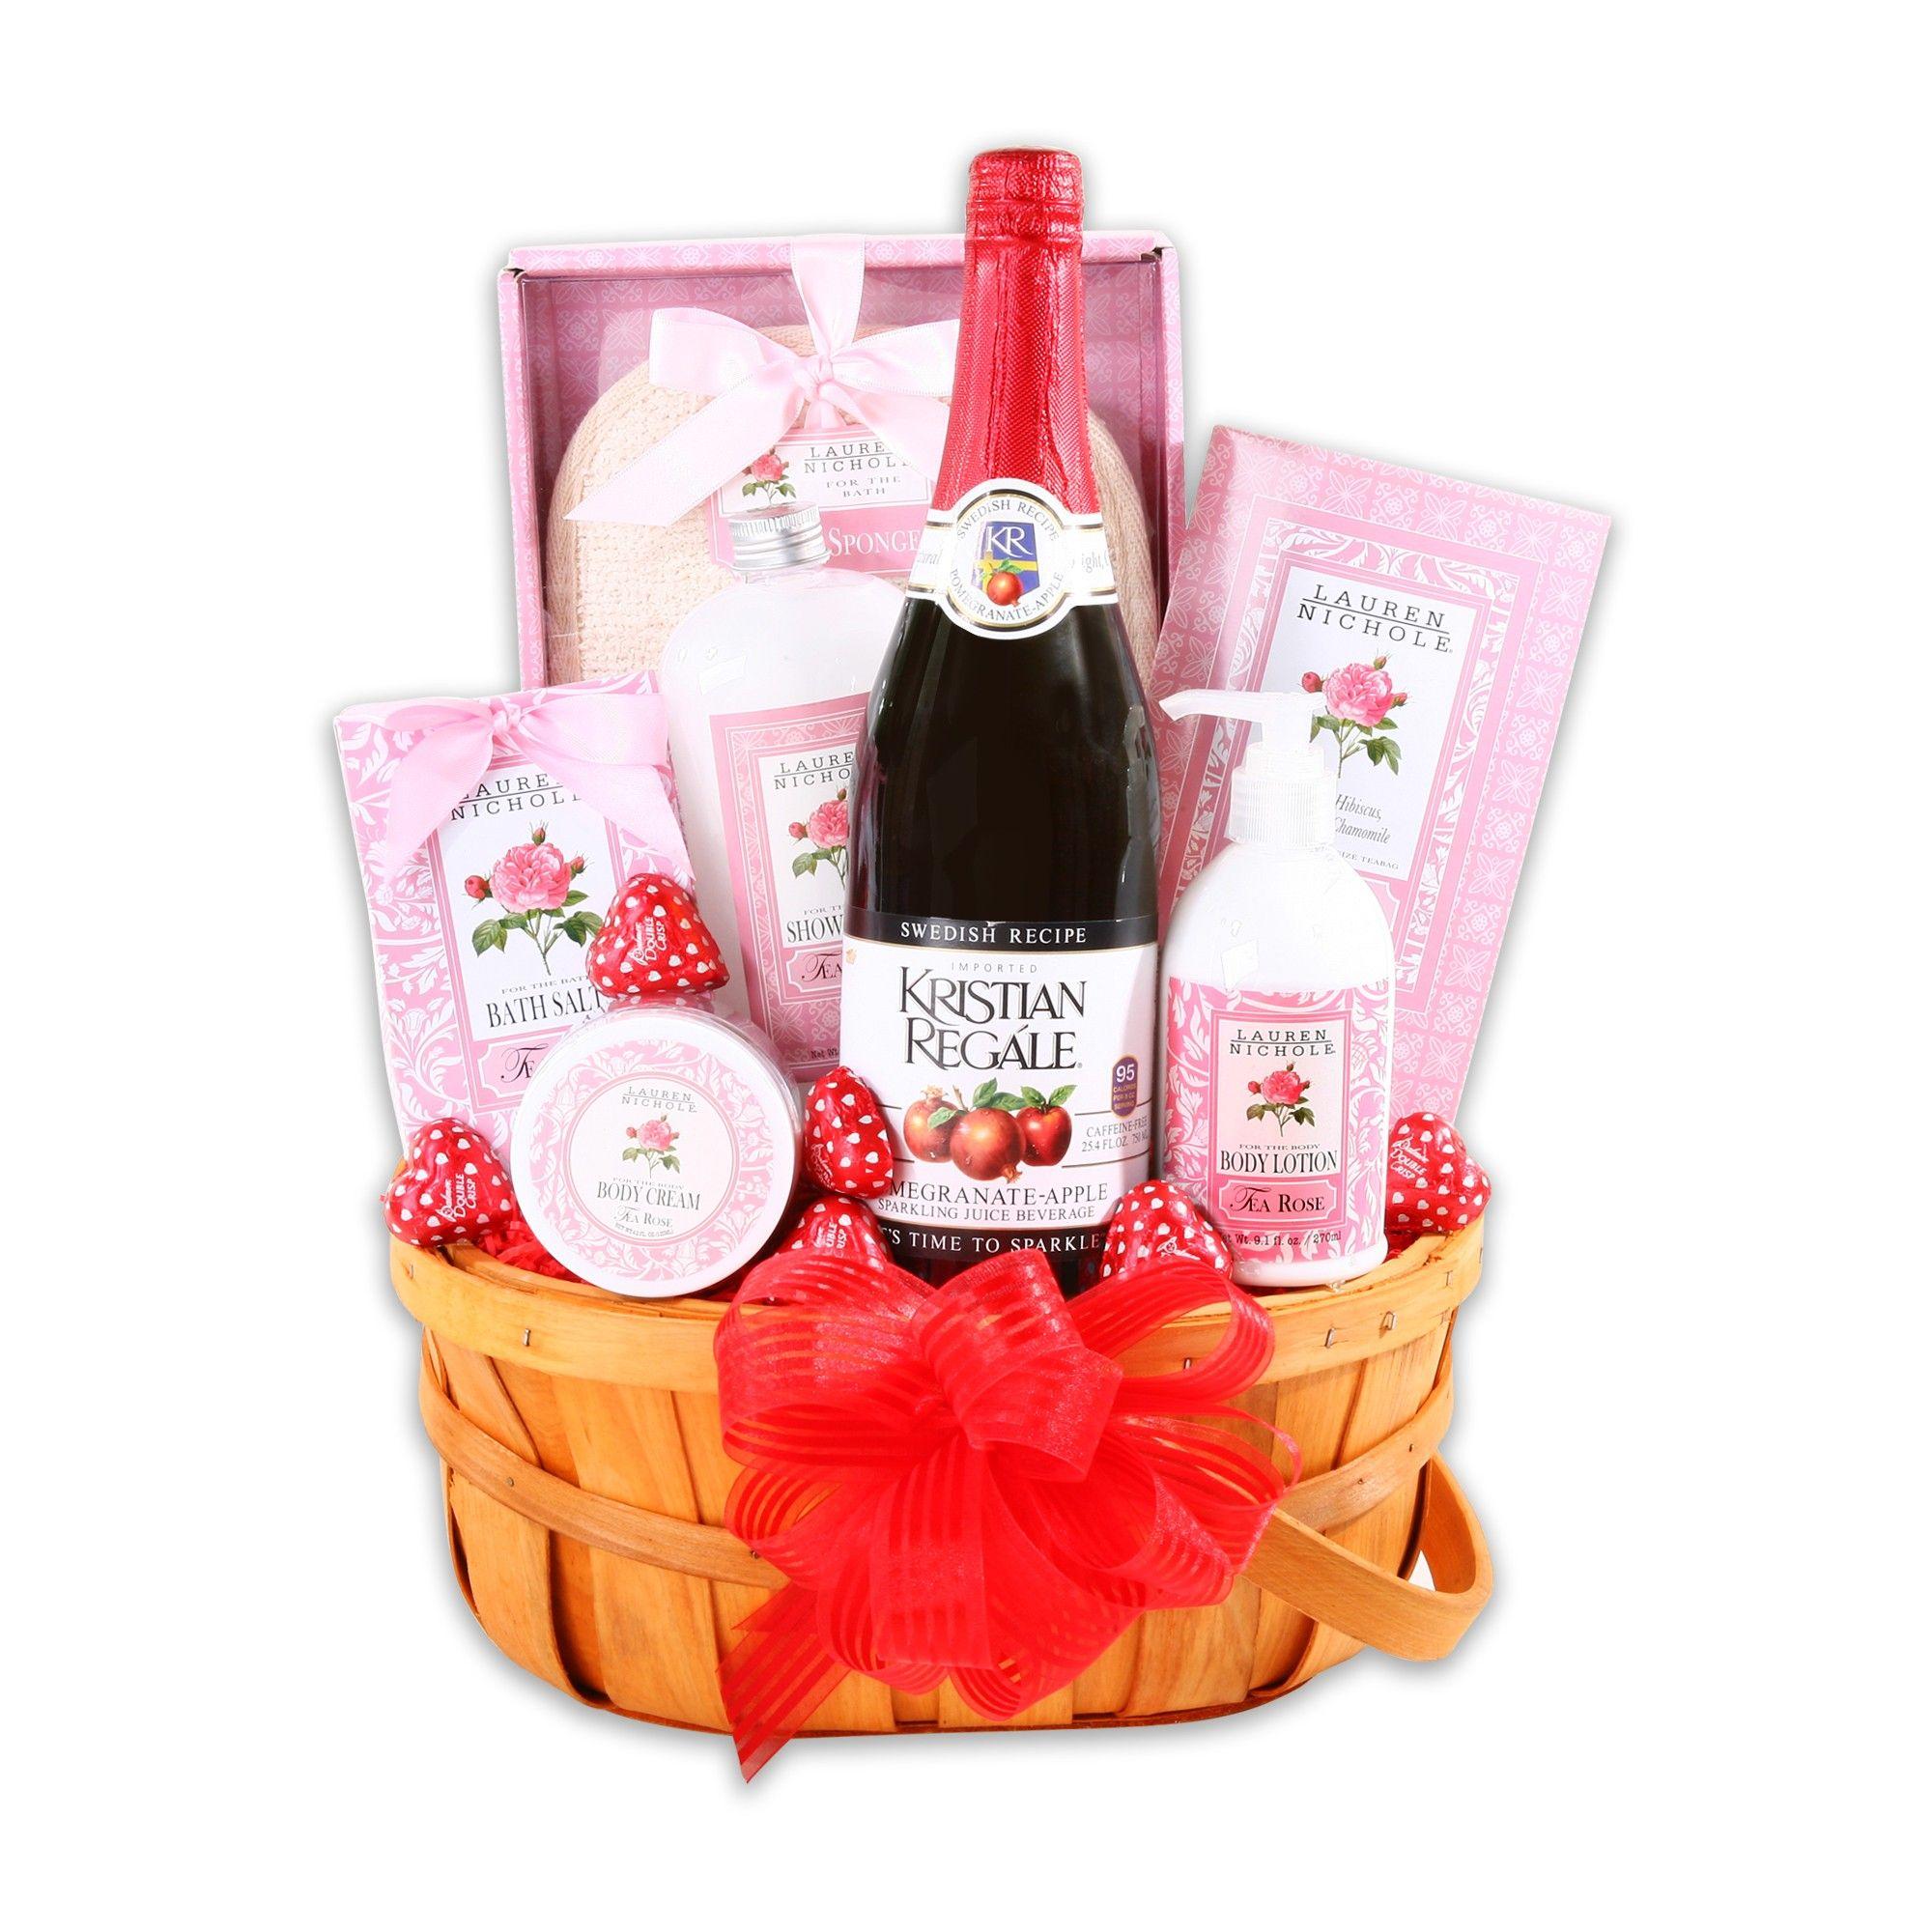 Alder creek gift basket valentines love relaxation gift